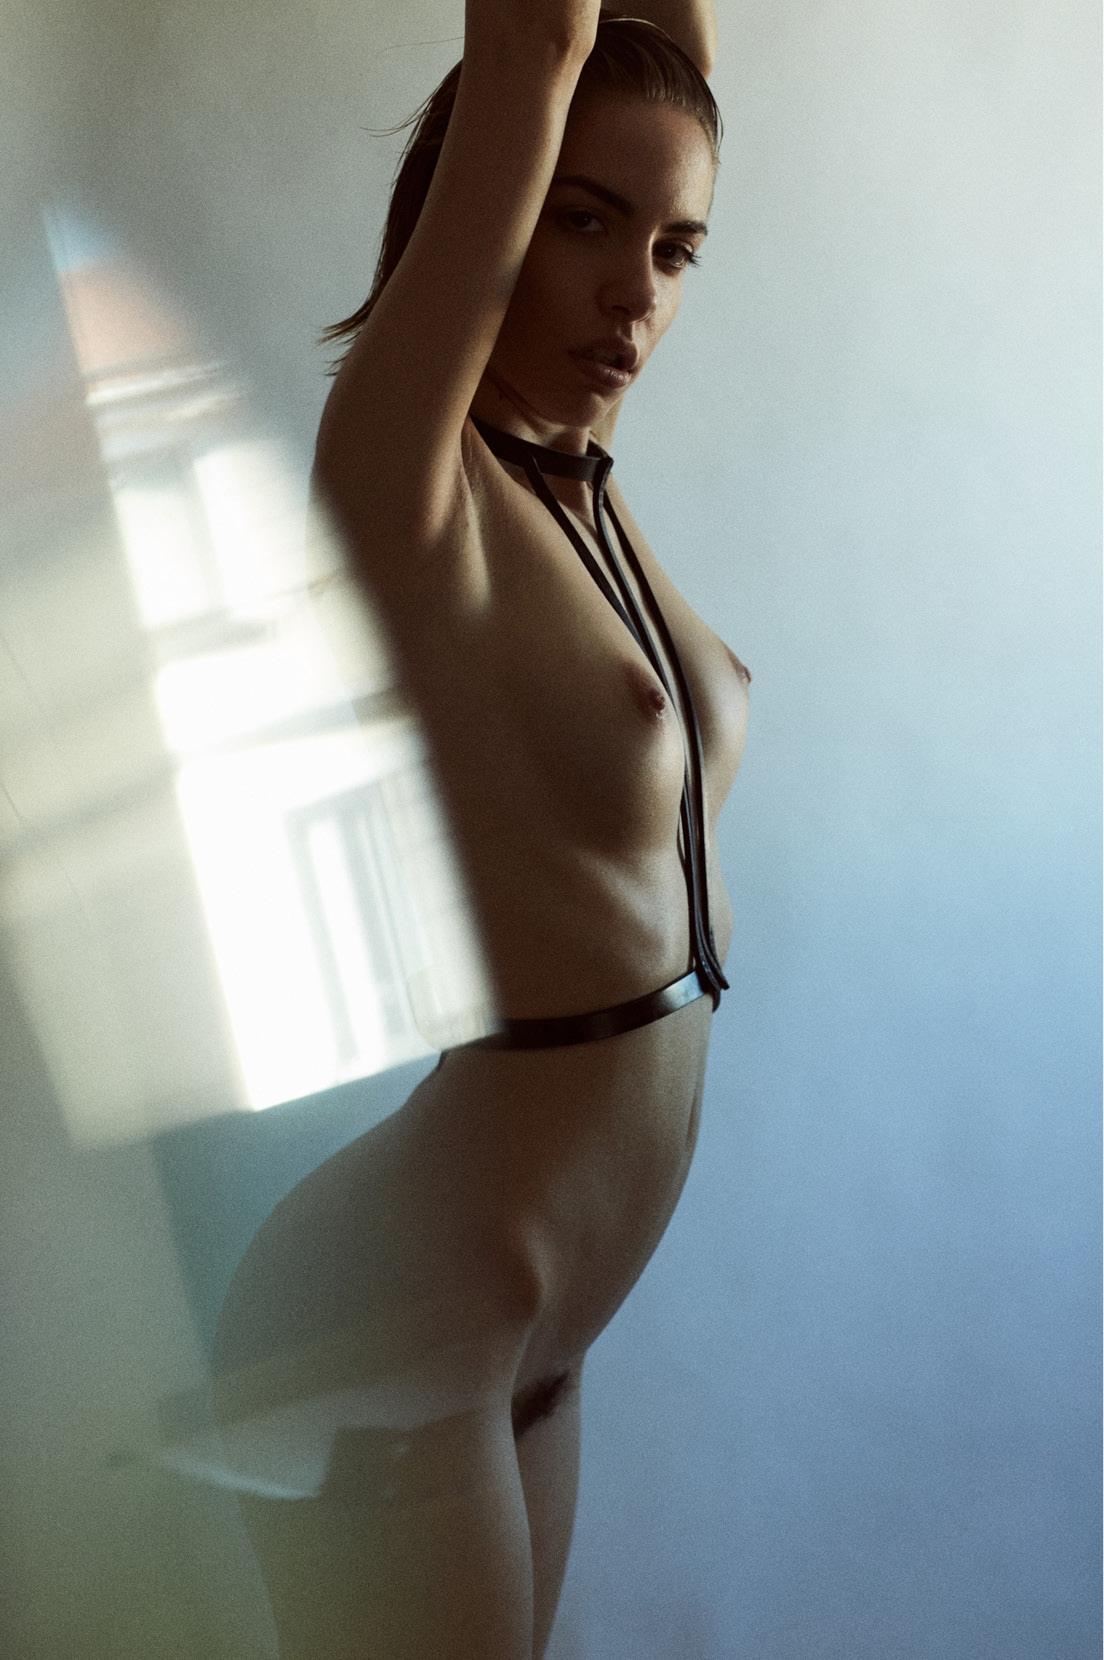 Rebecca Bagnol by Matthieu Sonnet